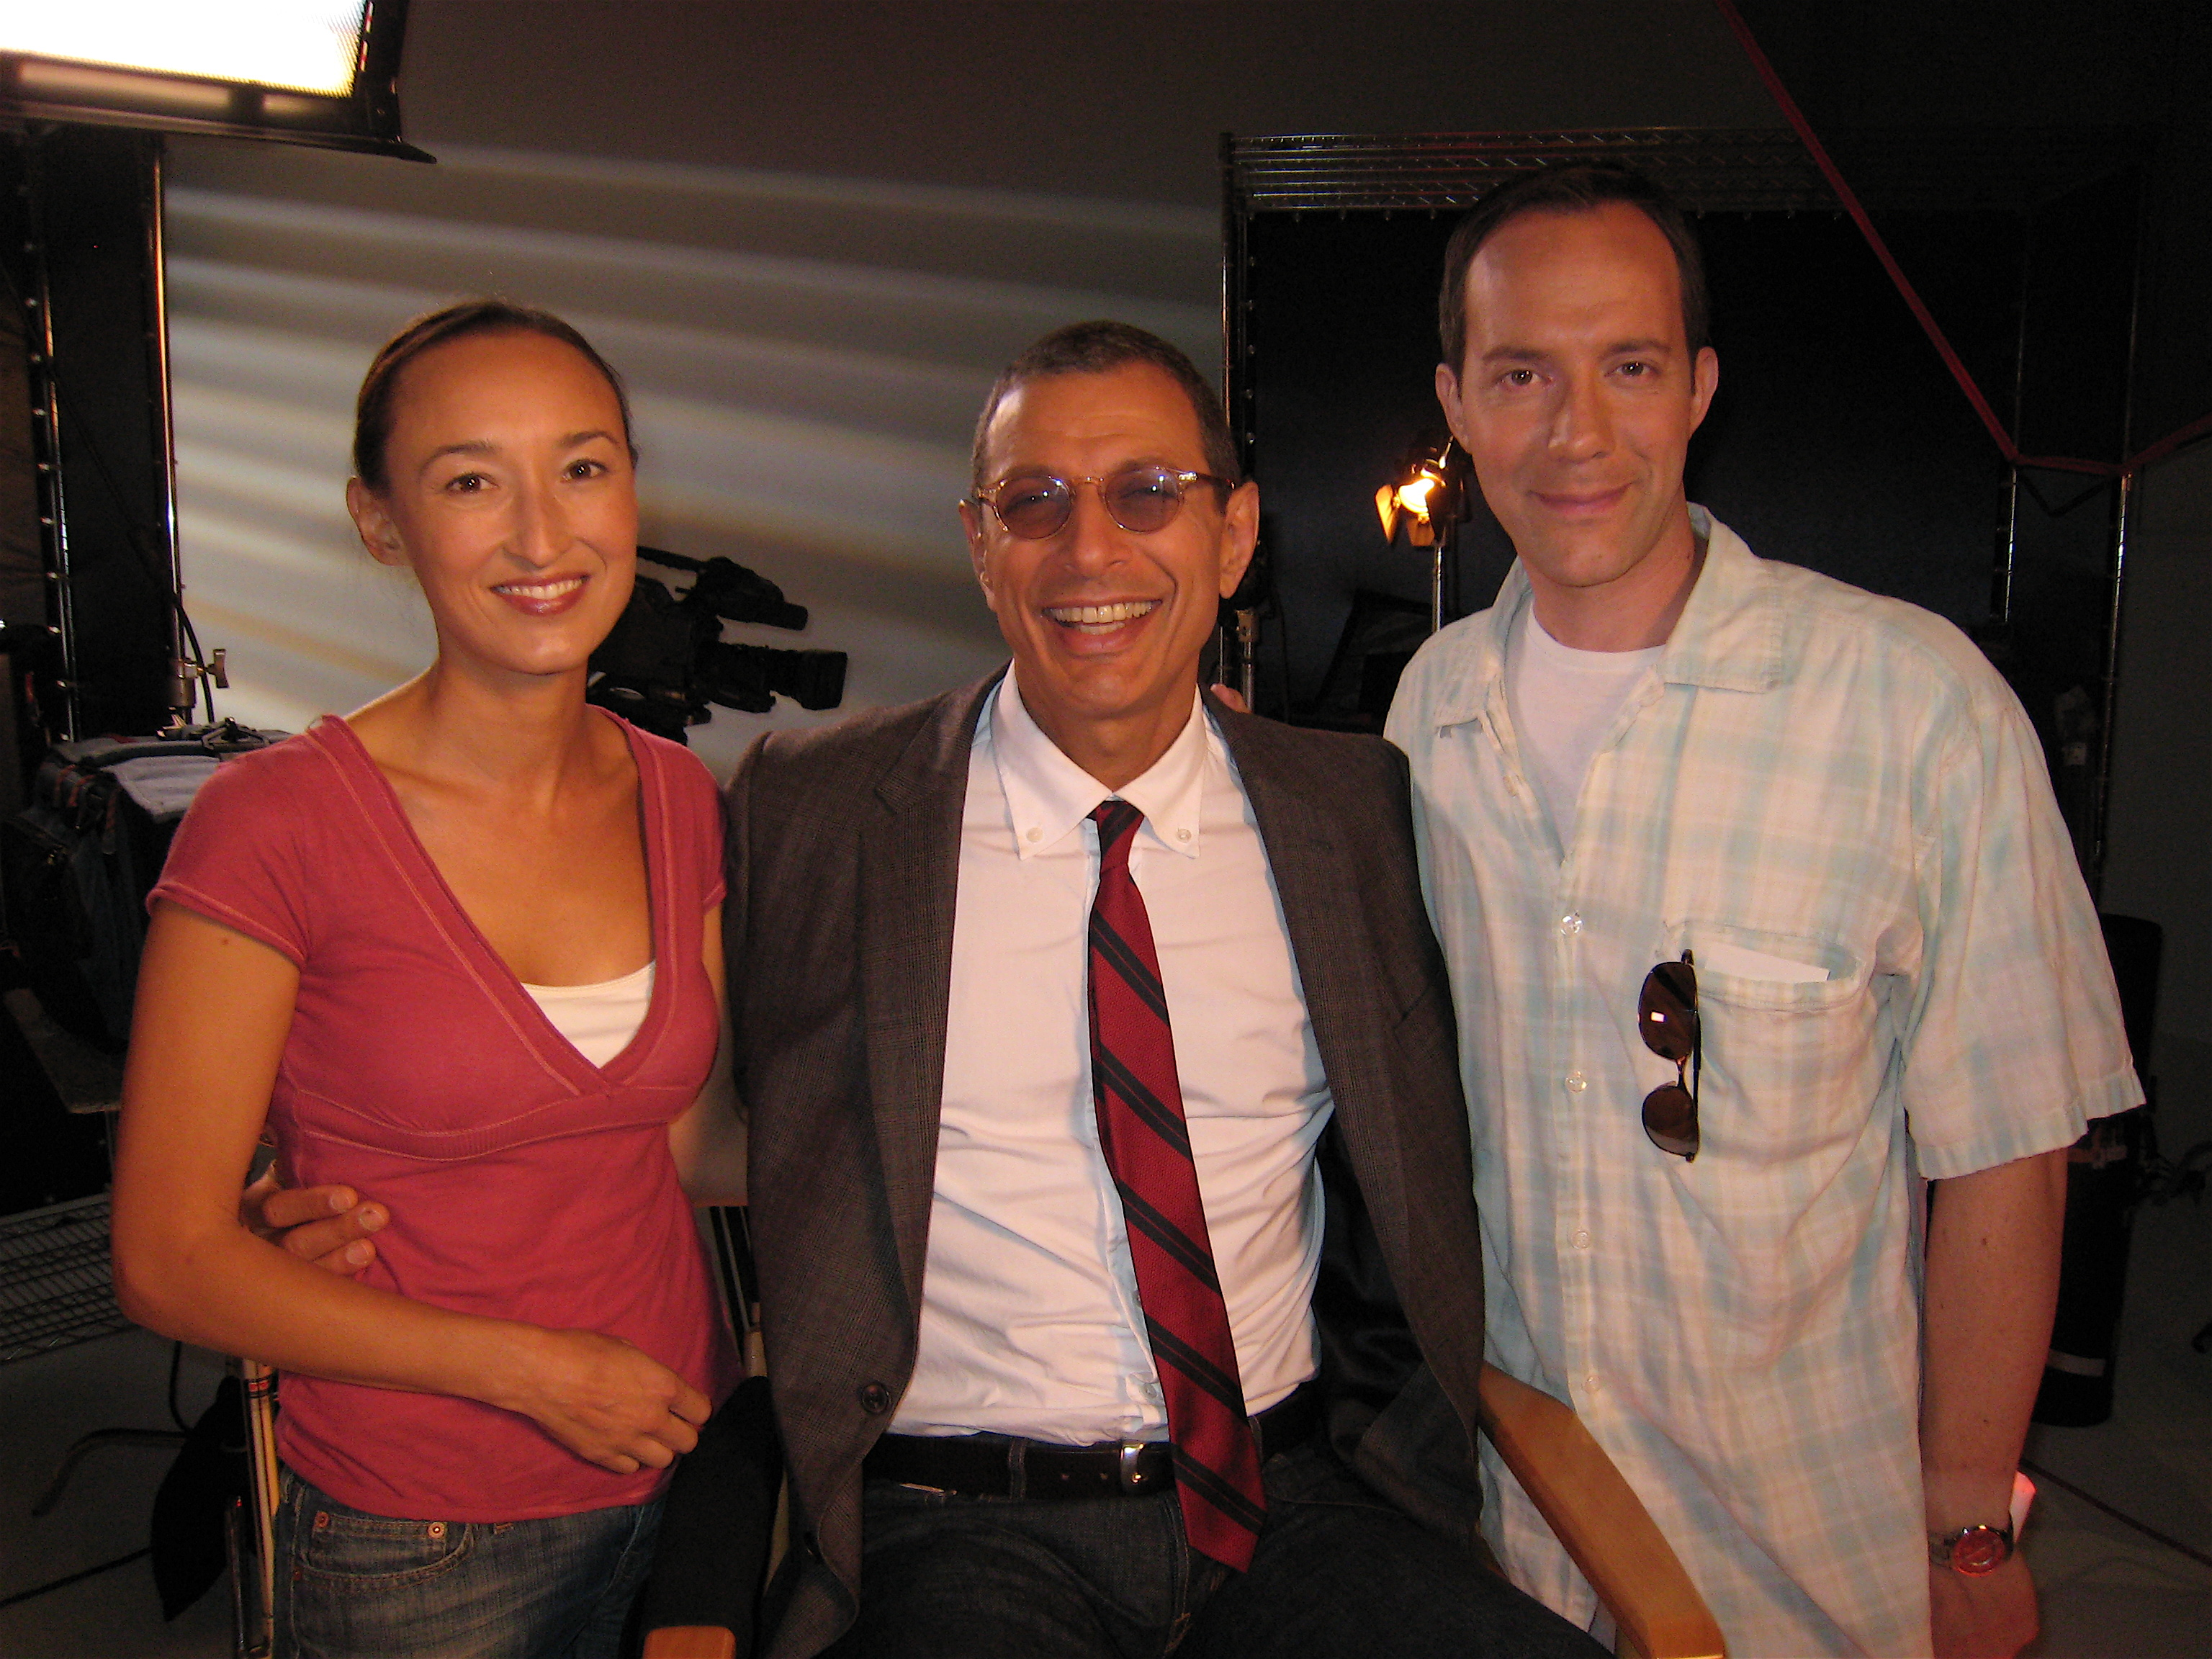 Shooting with Jeff Goldblum!